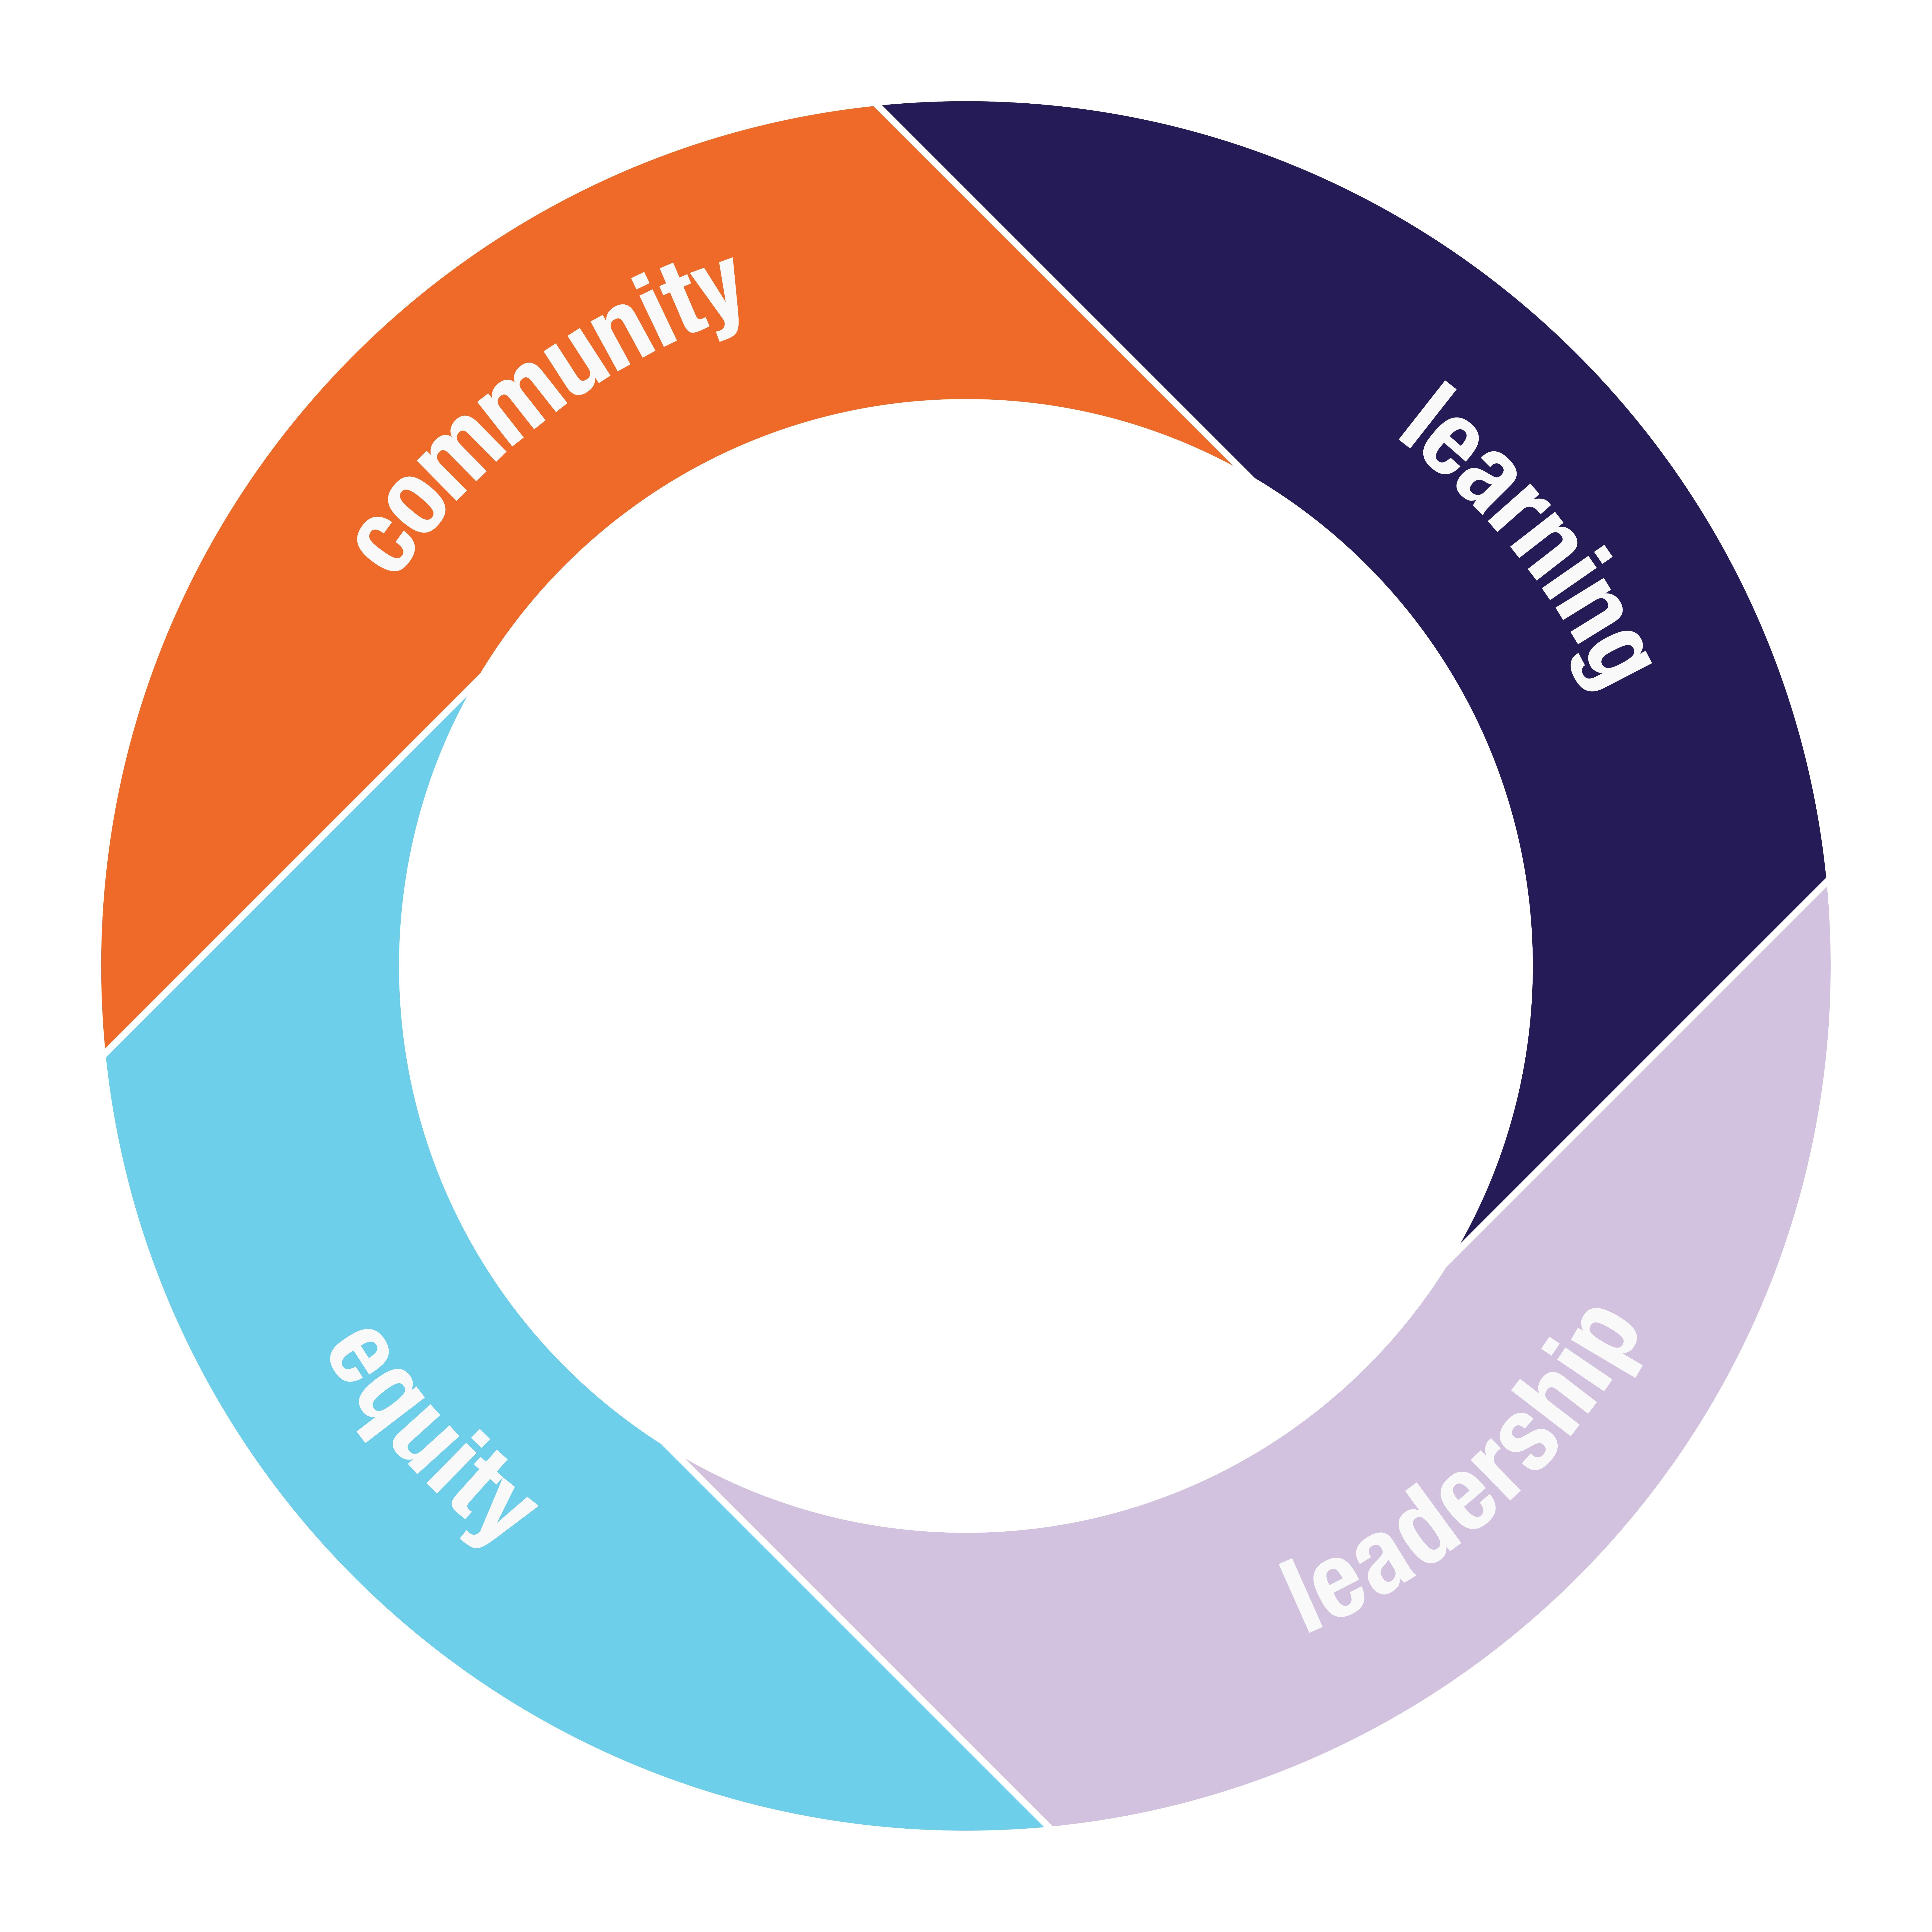 Philanthropy New York's New Organizational Values